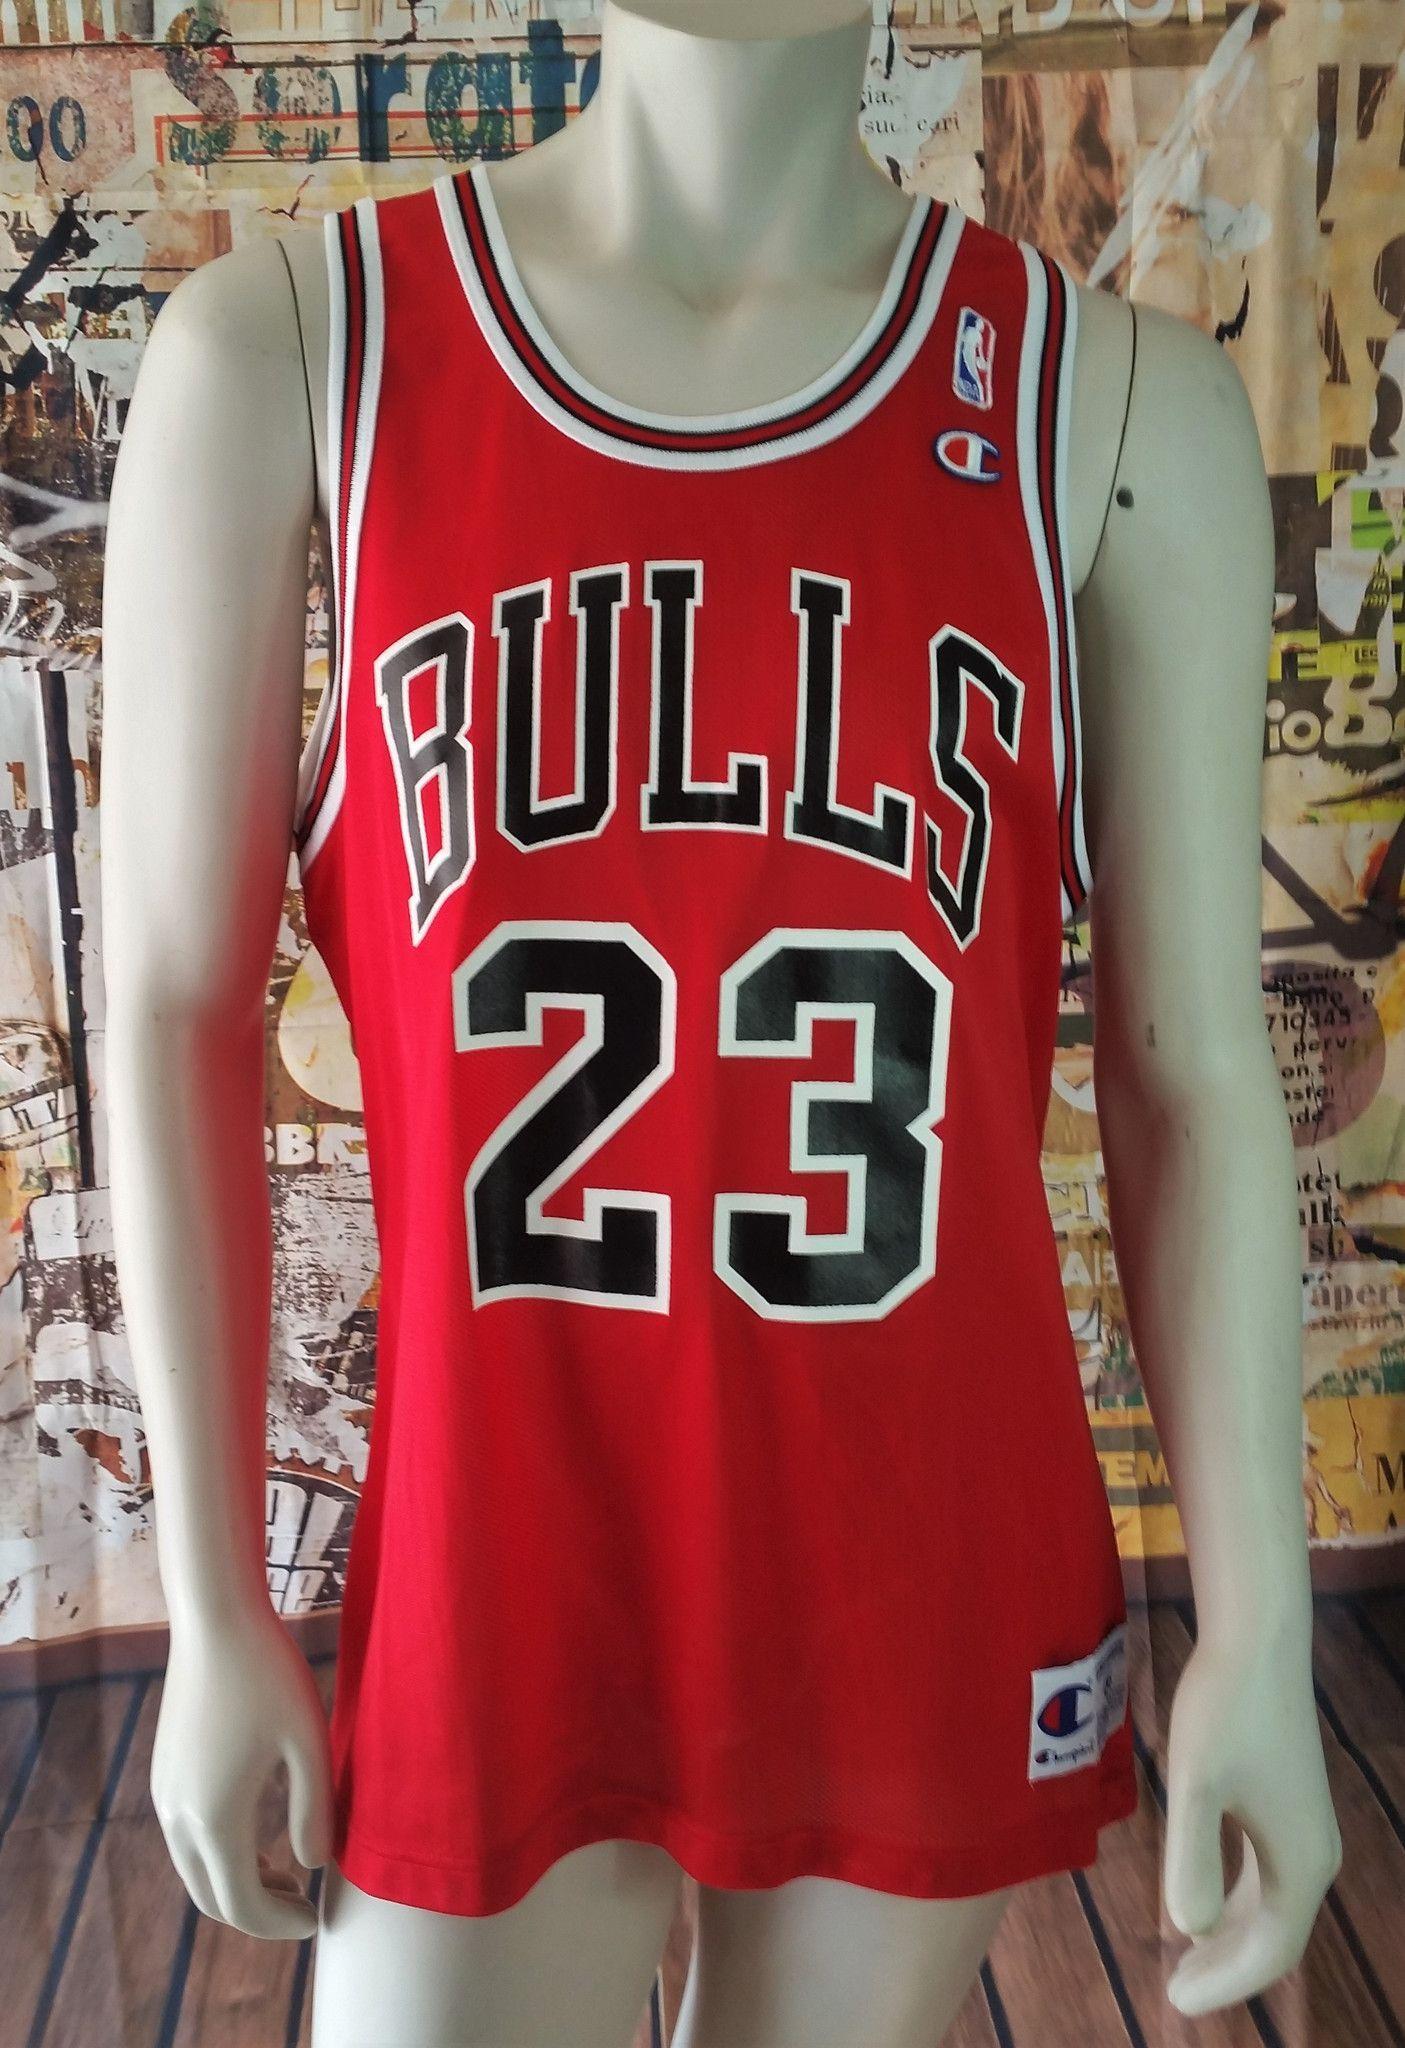 902477e6a50 Michael Jordan Vintage Champion Jersey Chicago Bulls NBA Basketball Rare  Mens 44